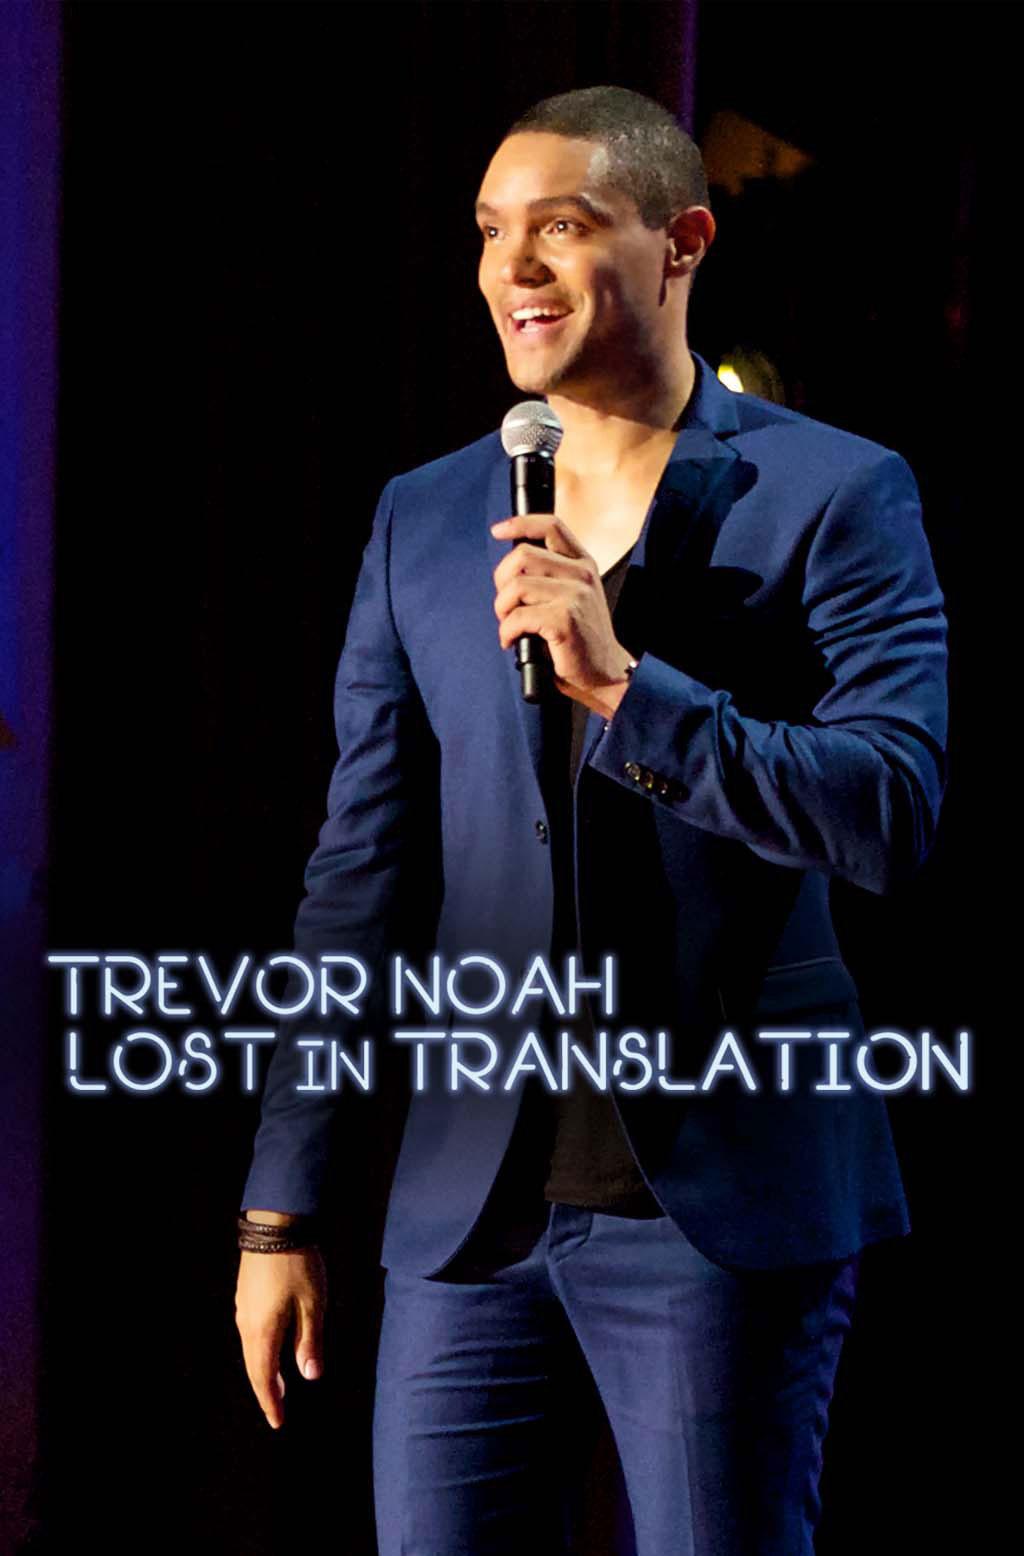 trevor-noah-lost-in-translation.jpg